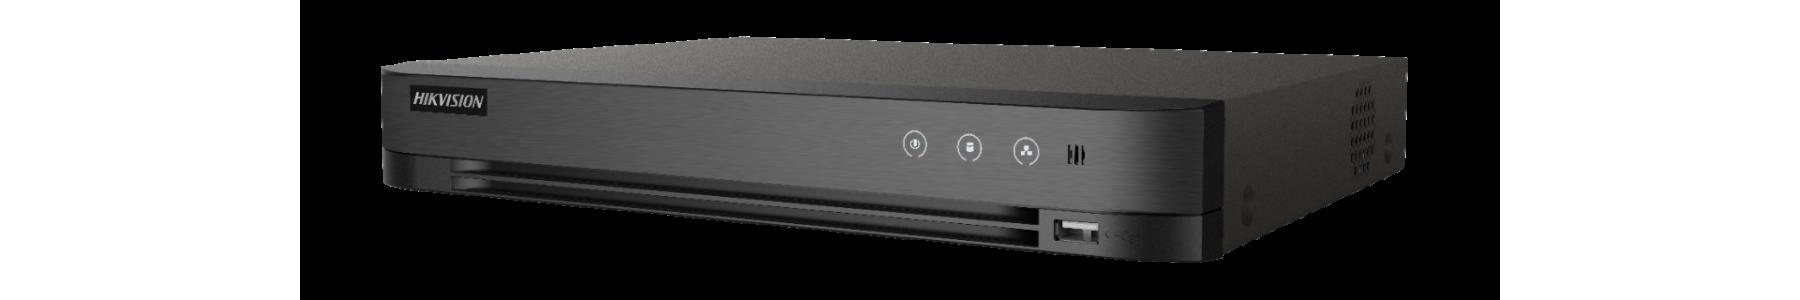 DVR SERIE 7200 HUHI ACUSENSE (HDD Incluso)